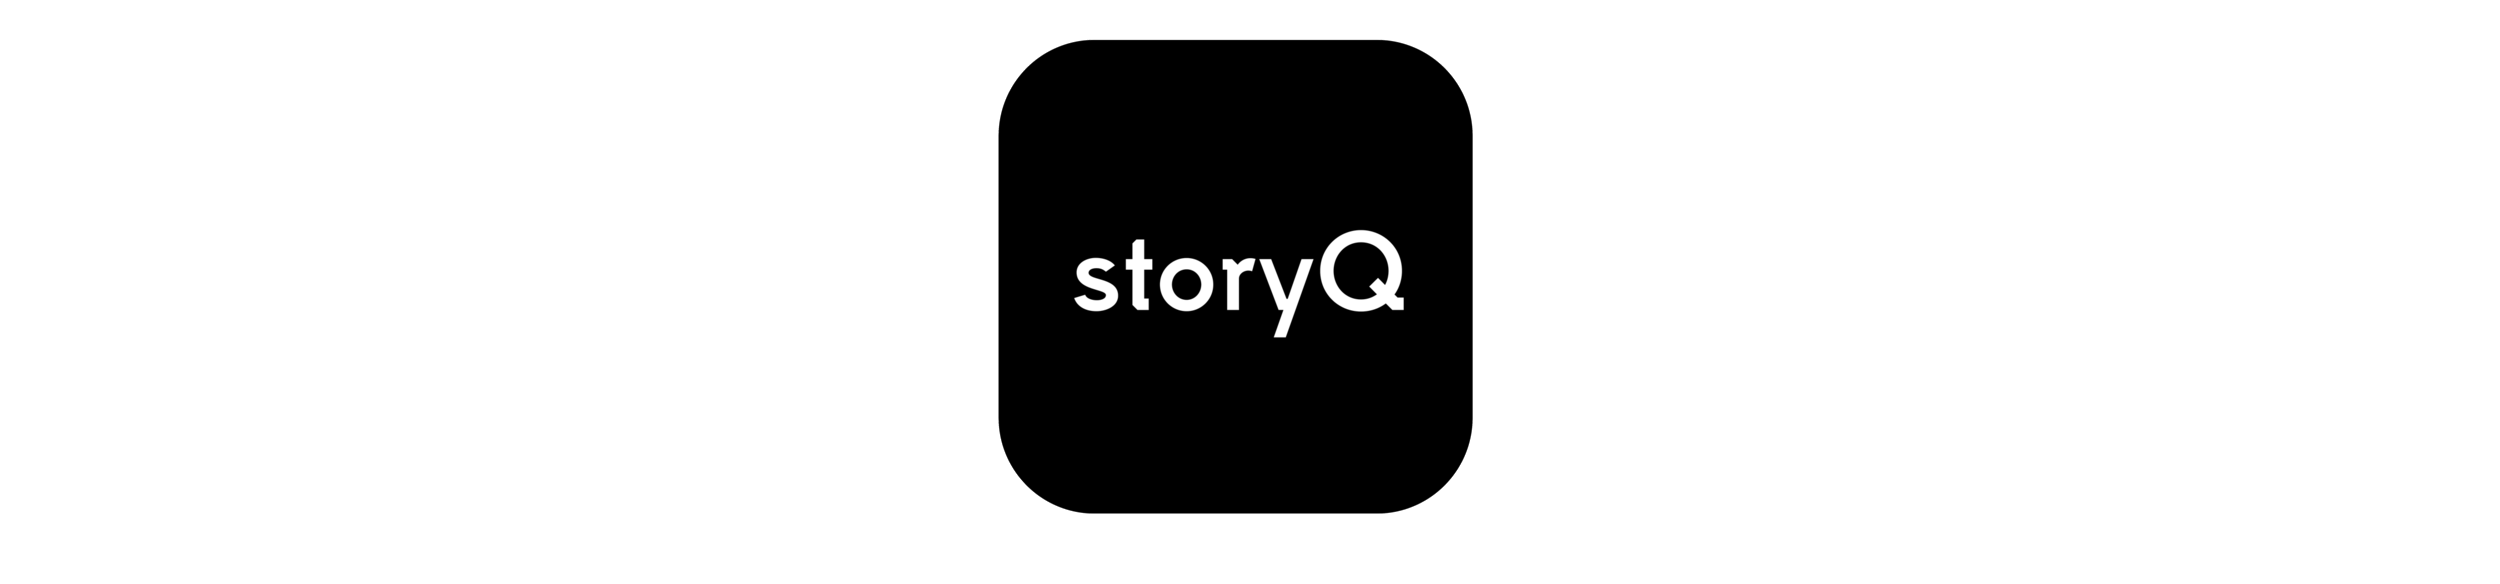 storyQlogoCENTER.png